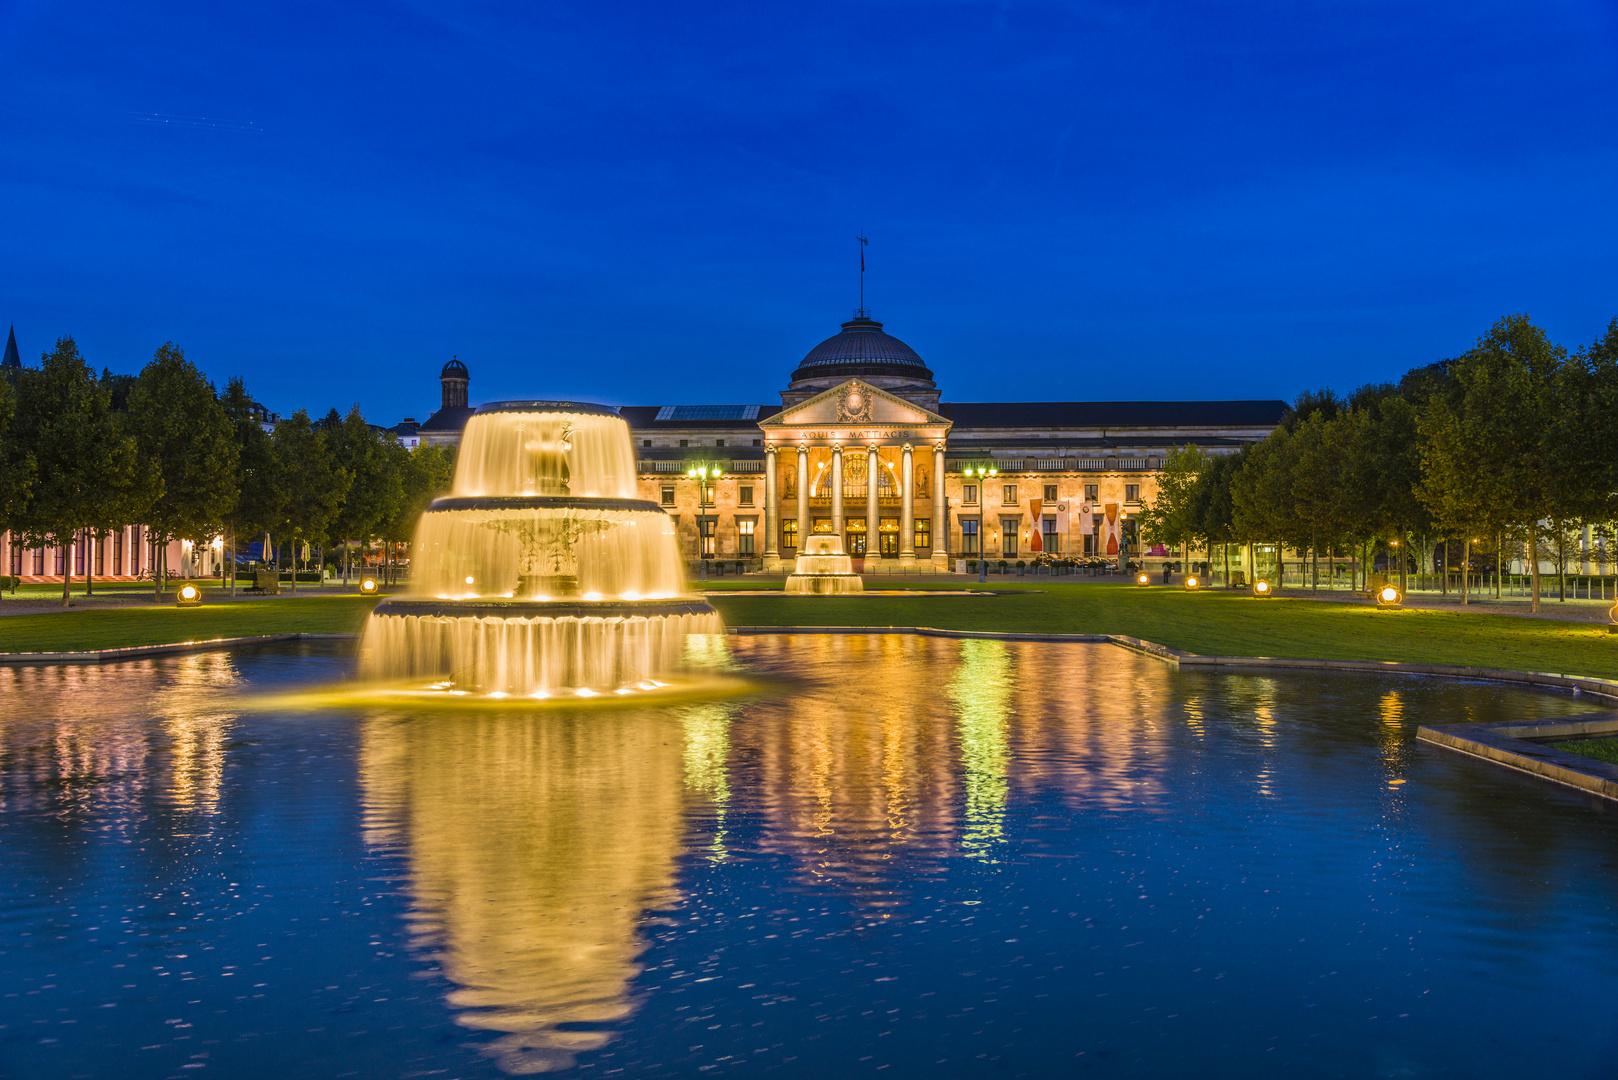 Kurhausplatz Wiesbaden